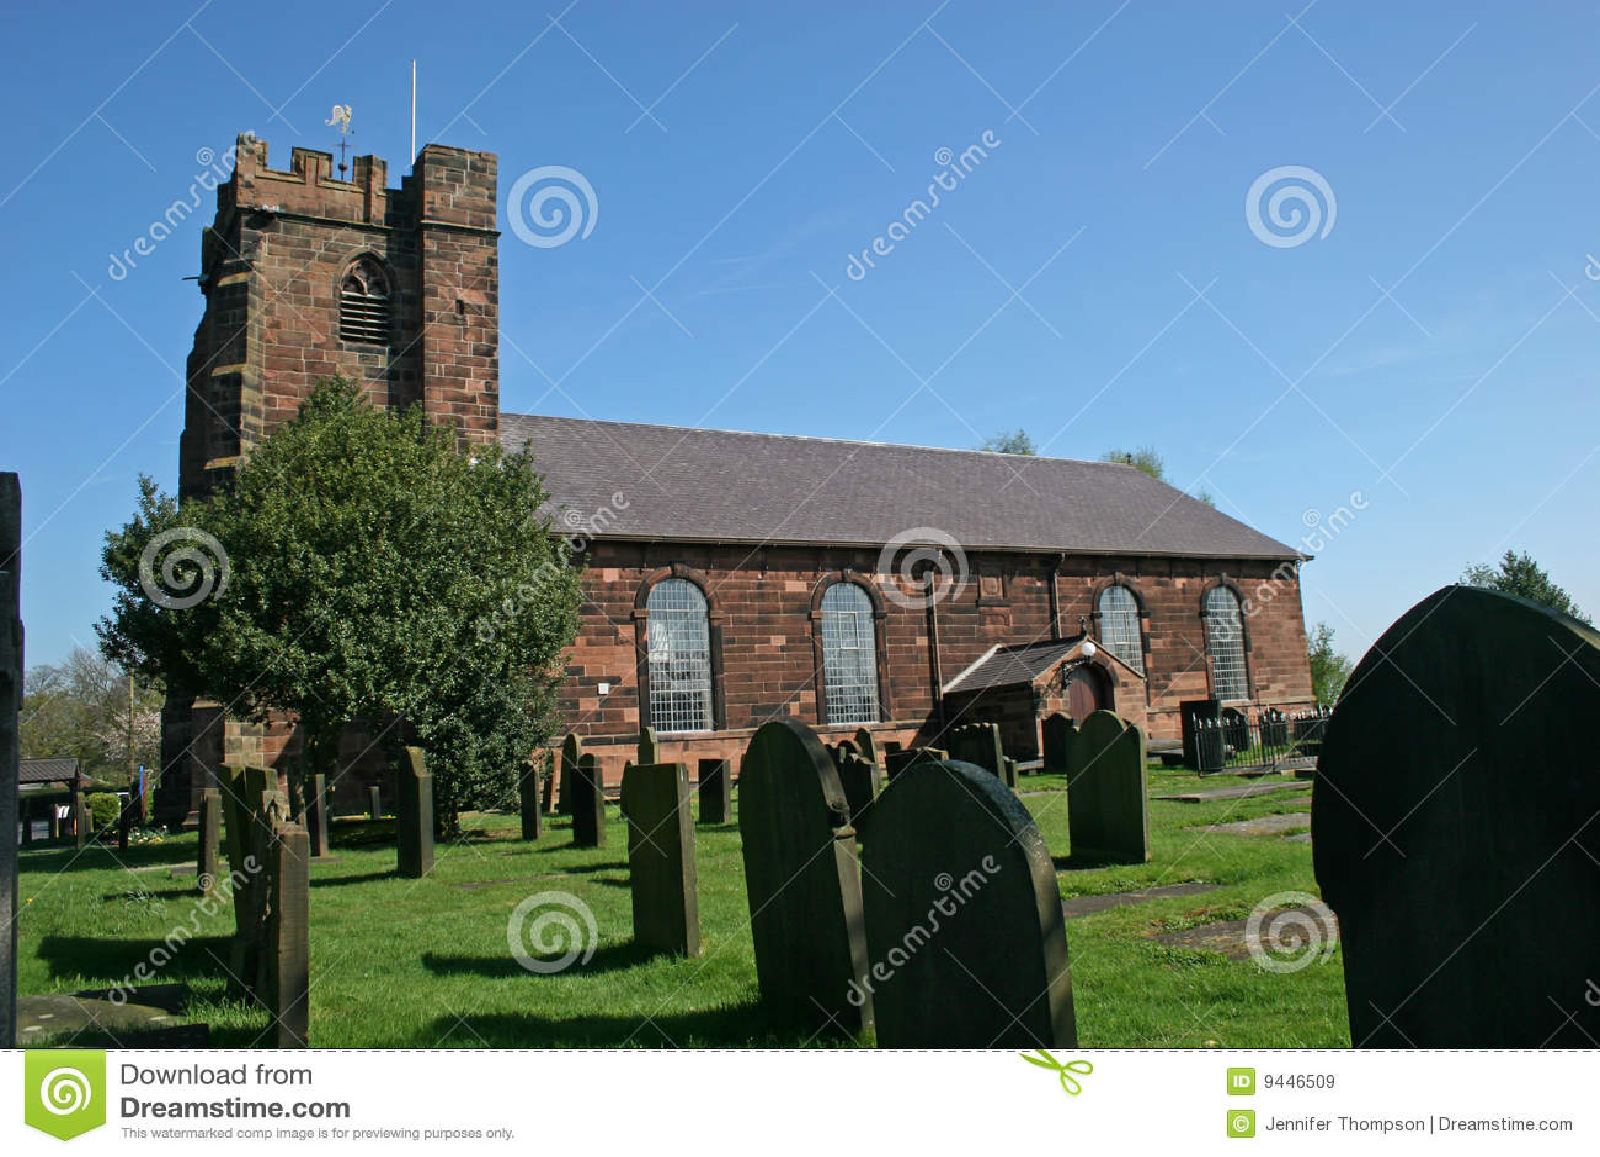 Hale church, Liverpool